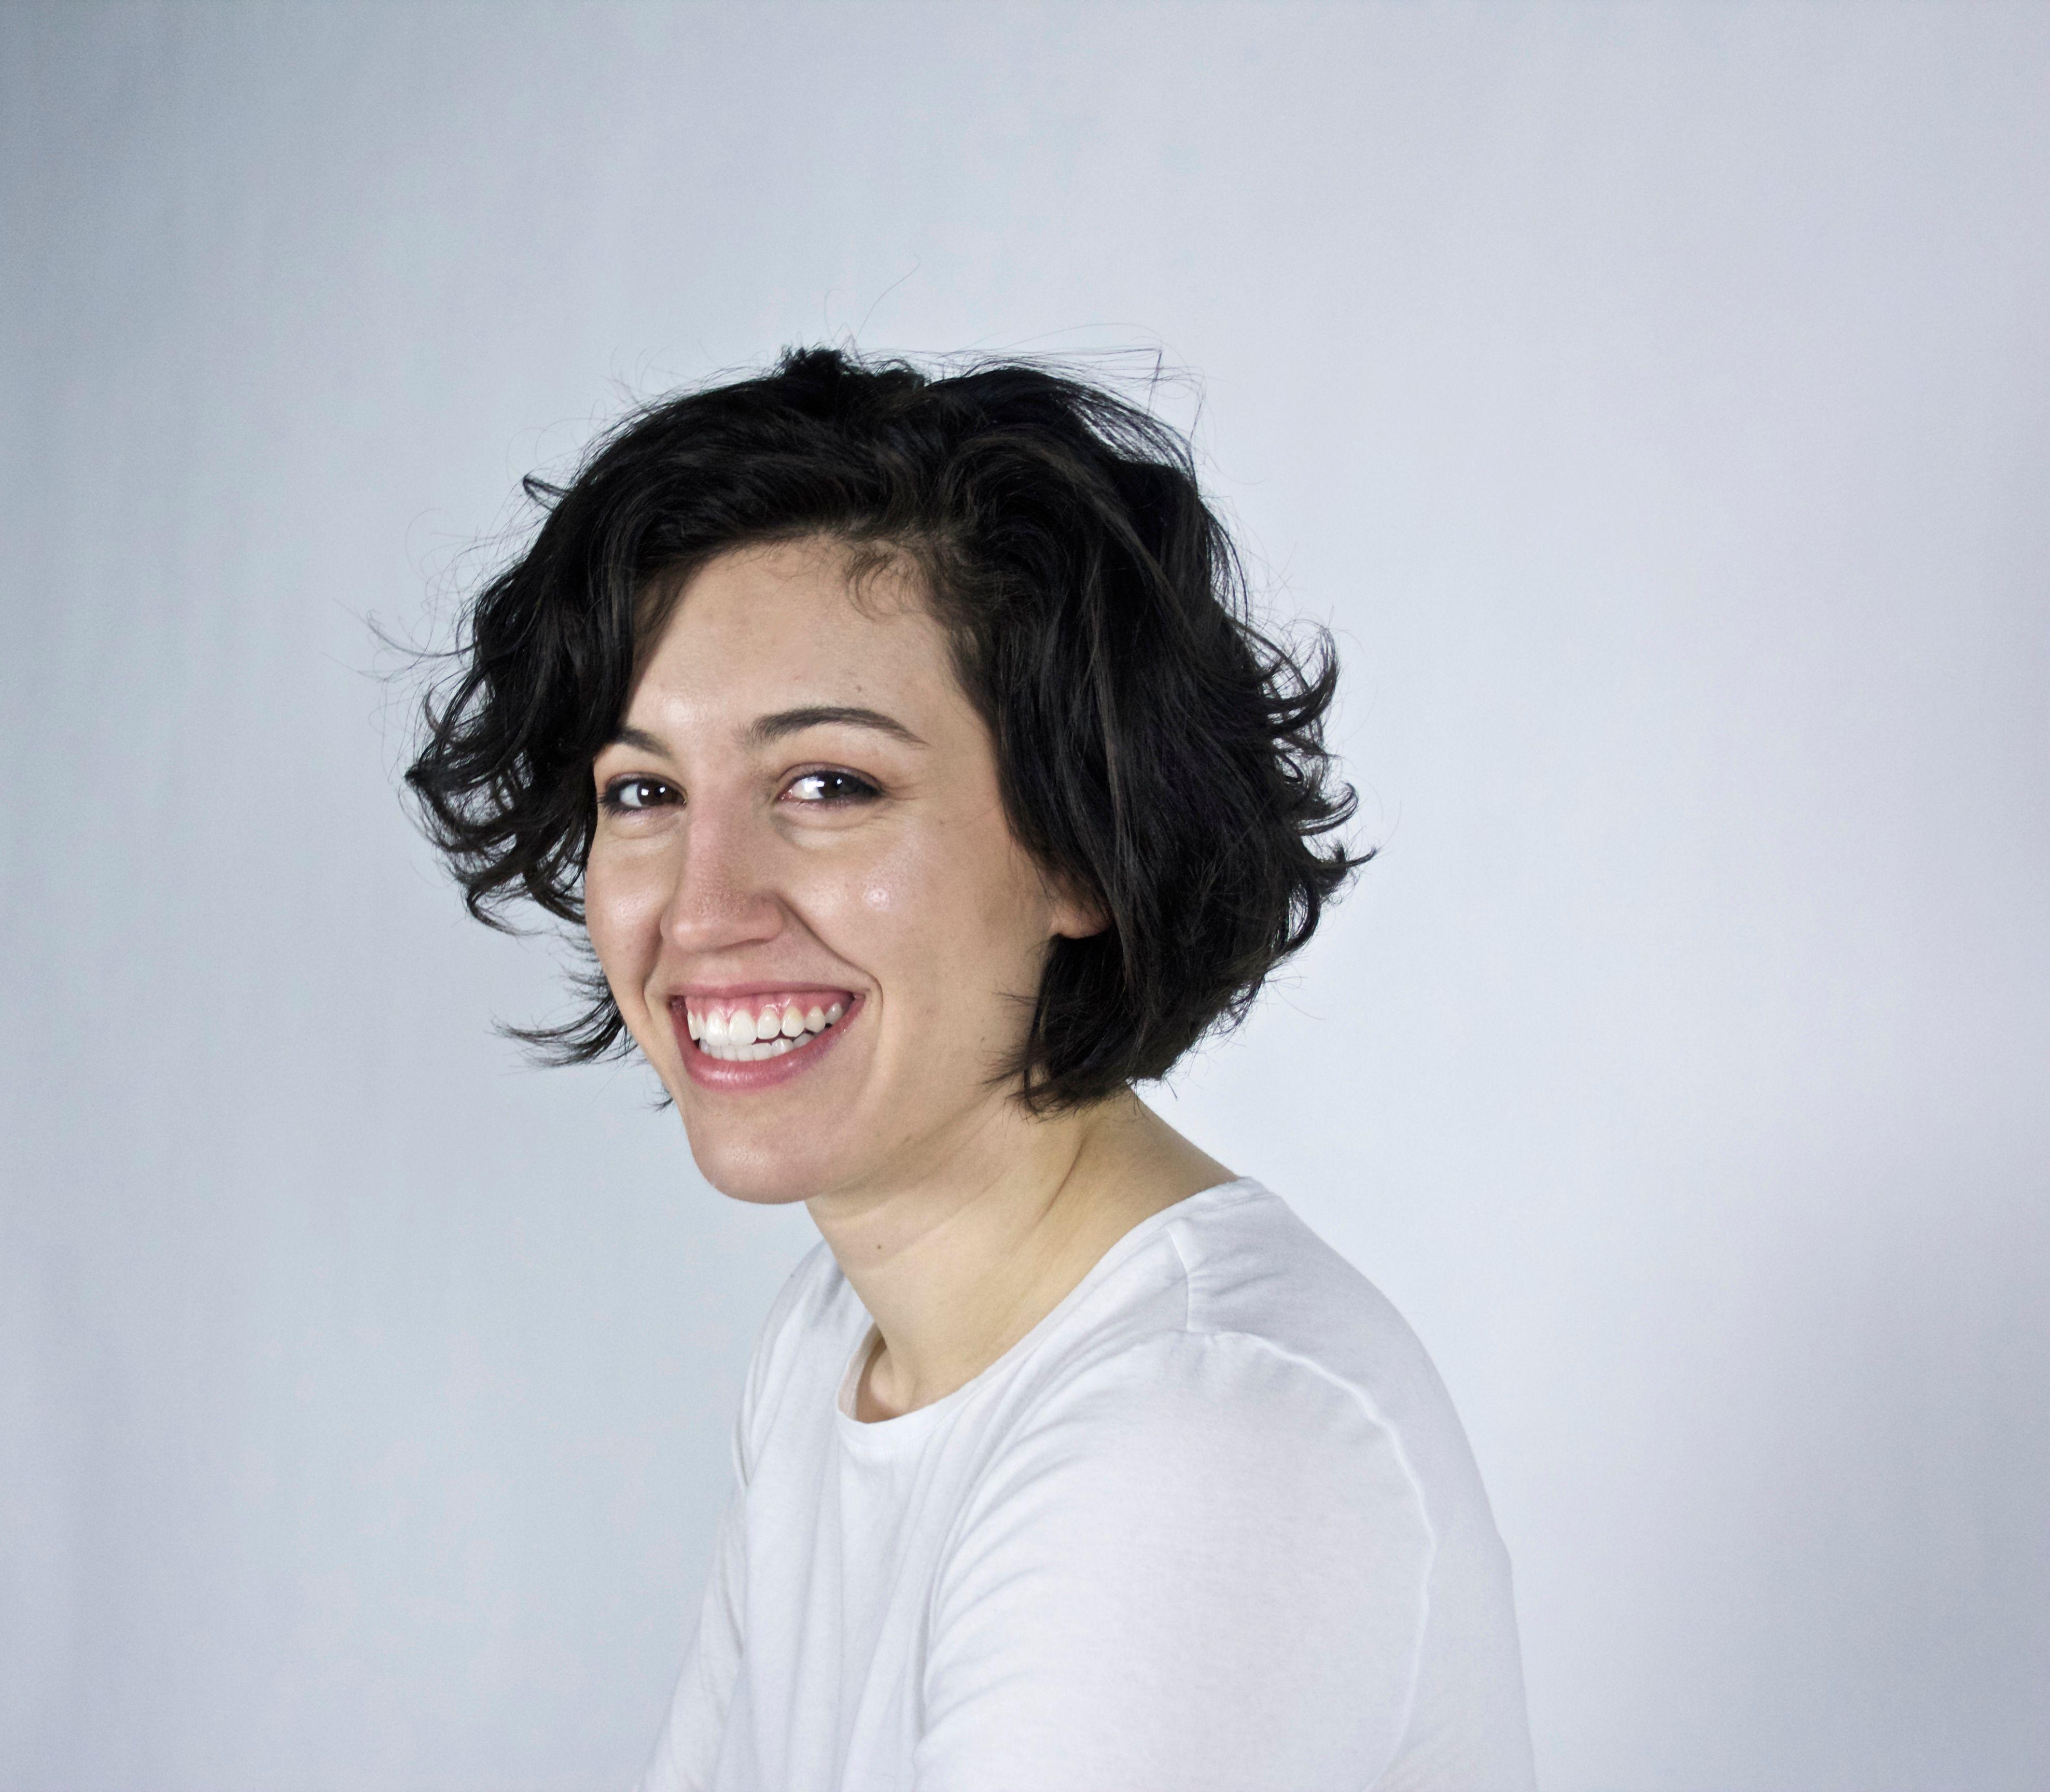 Claire Feinberg